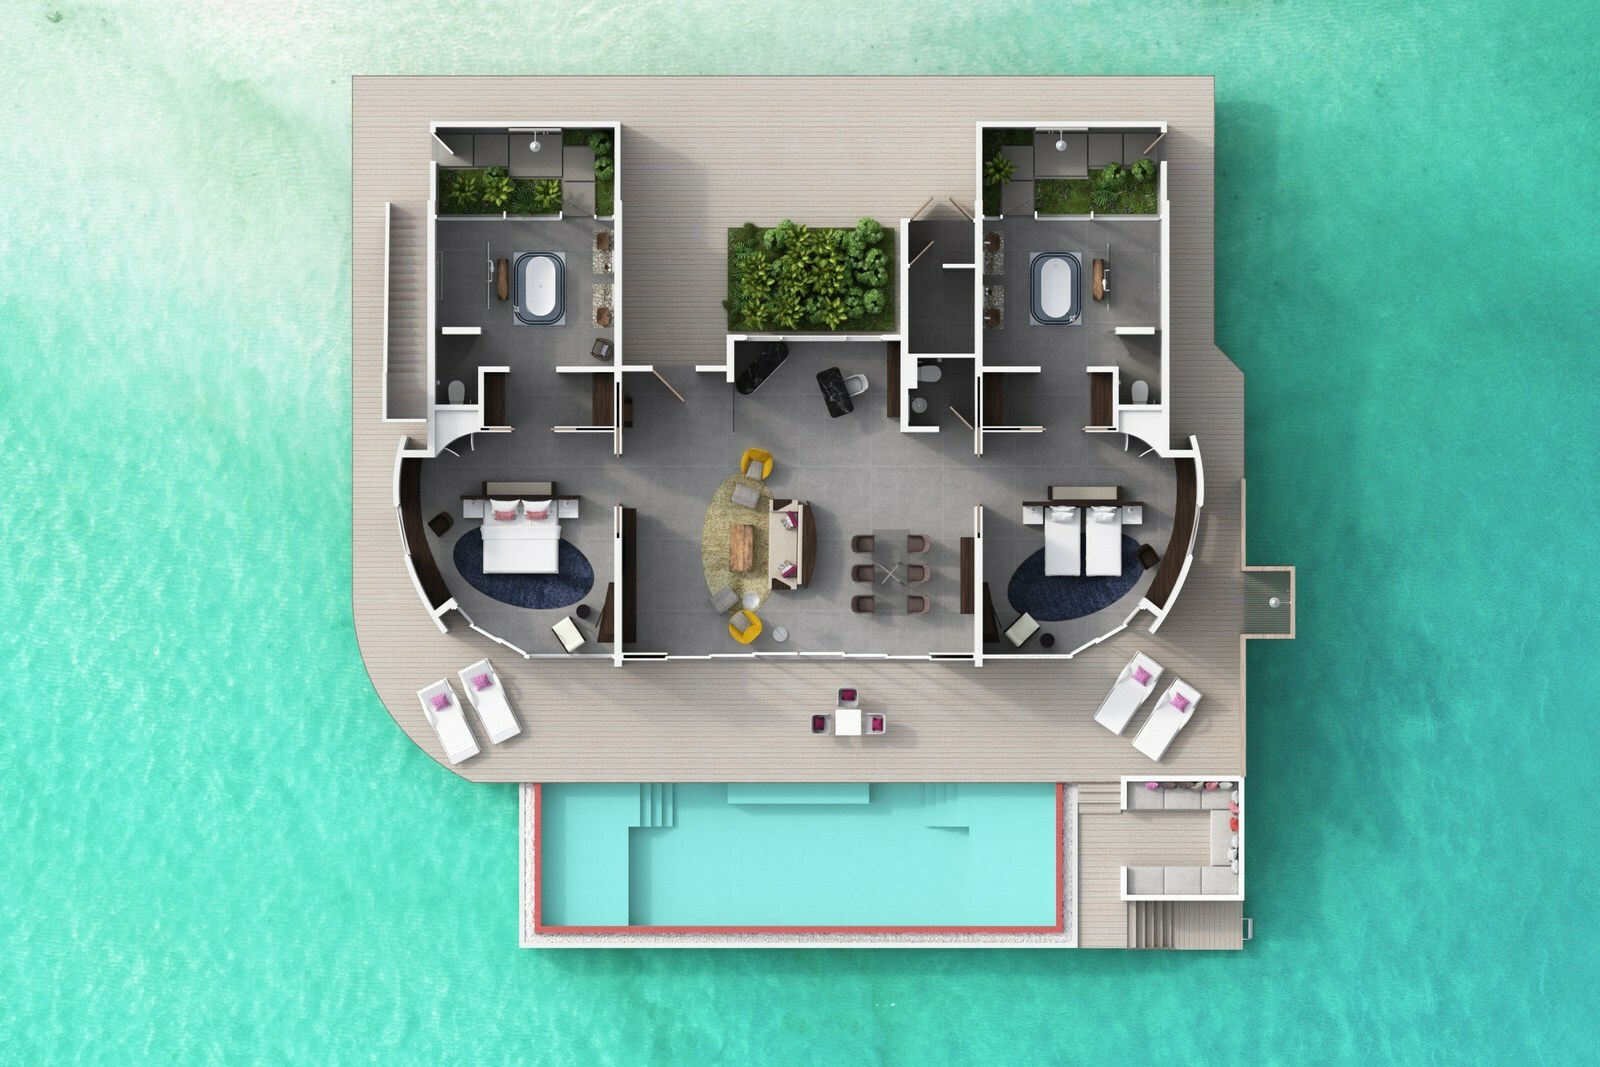 Мальдивы, отель LUX North Male Atoll, план-схема номера Over Water Residence 2 Bedroom with Pool